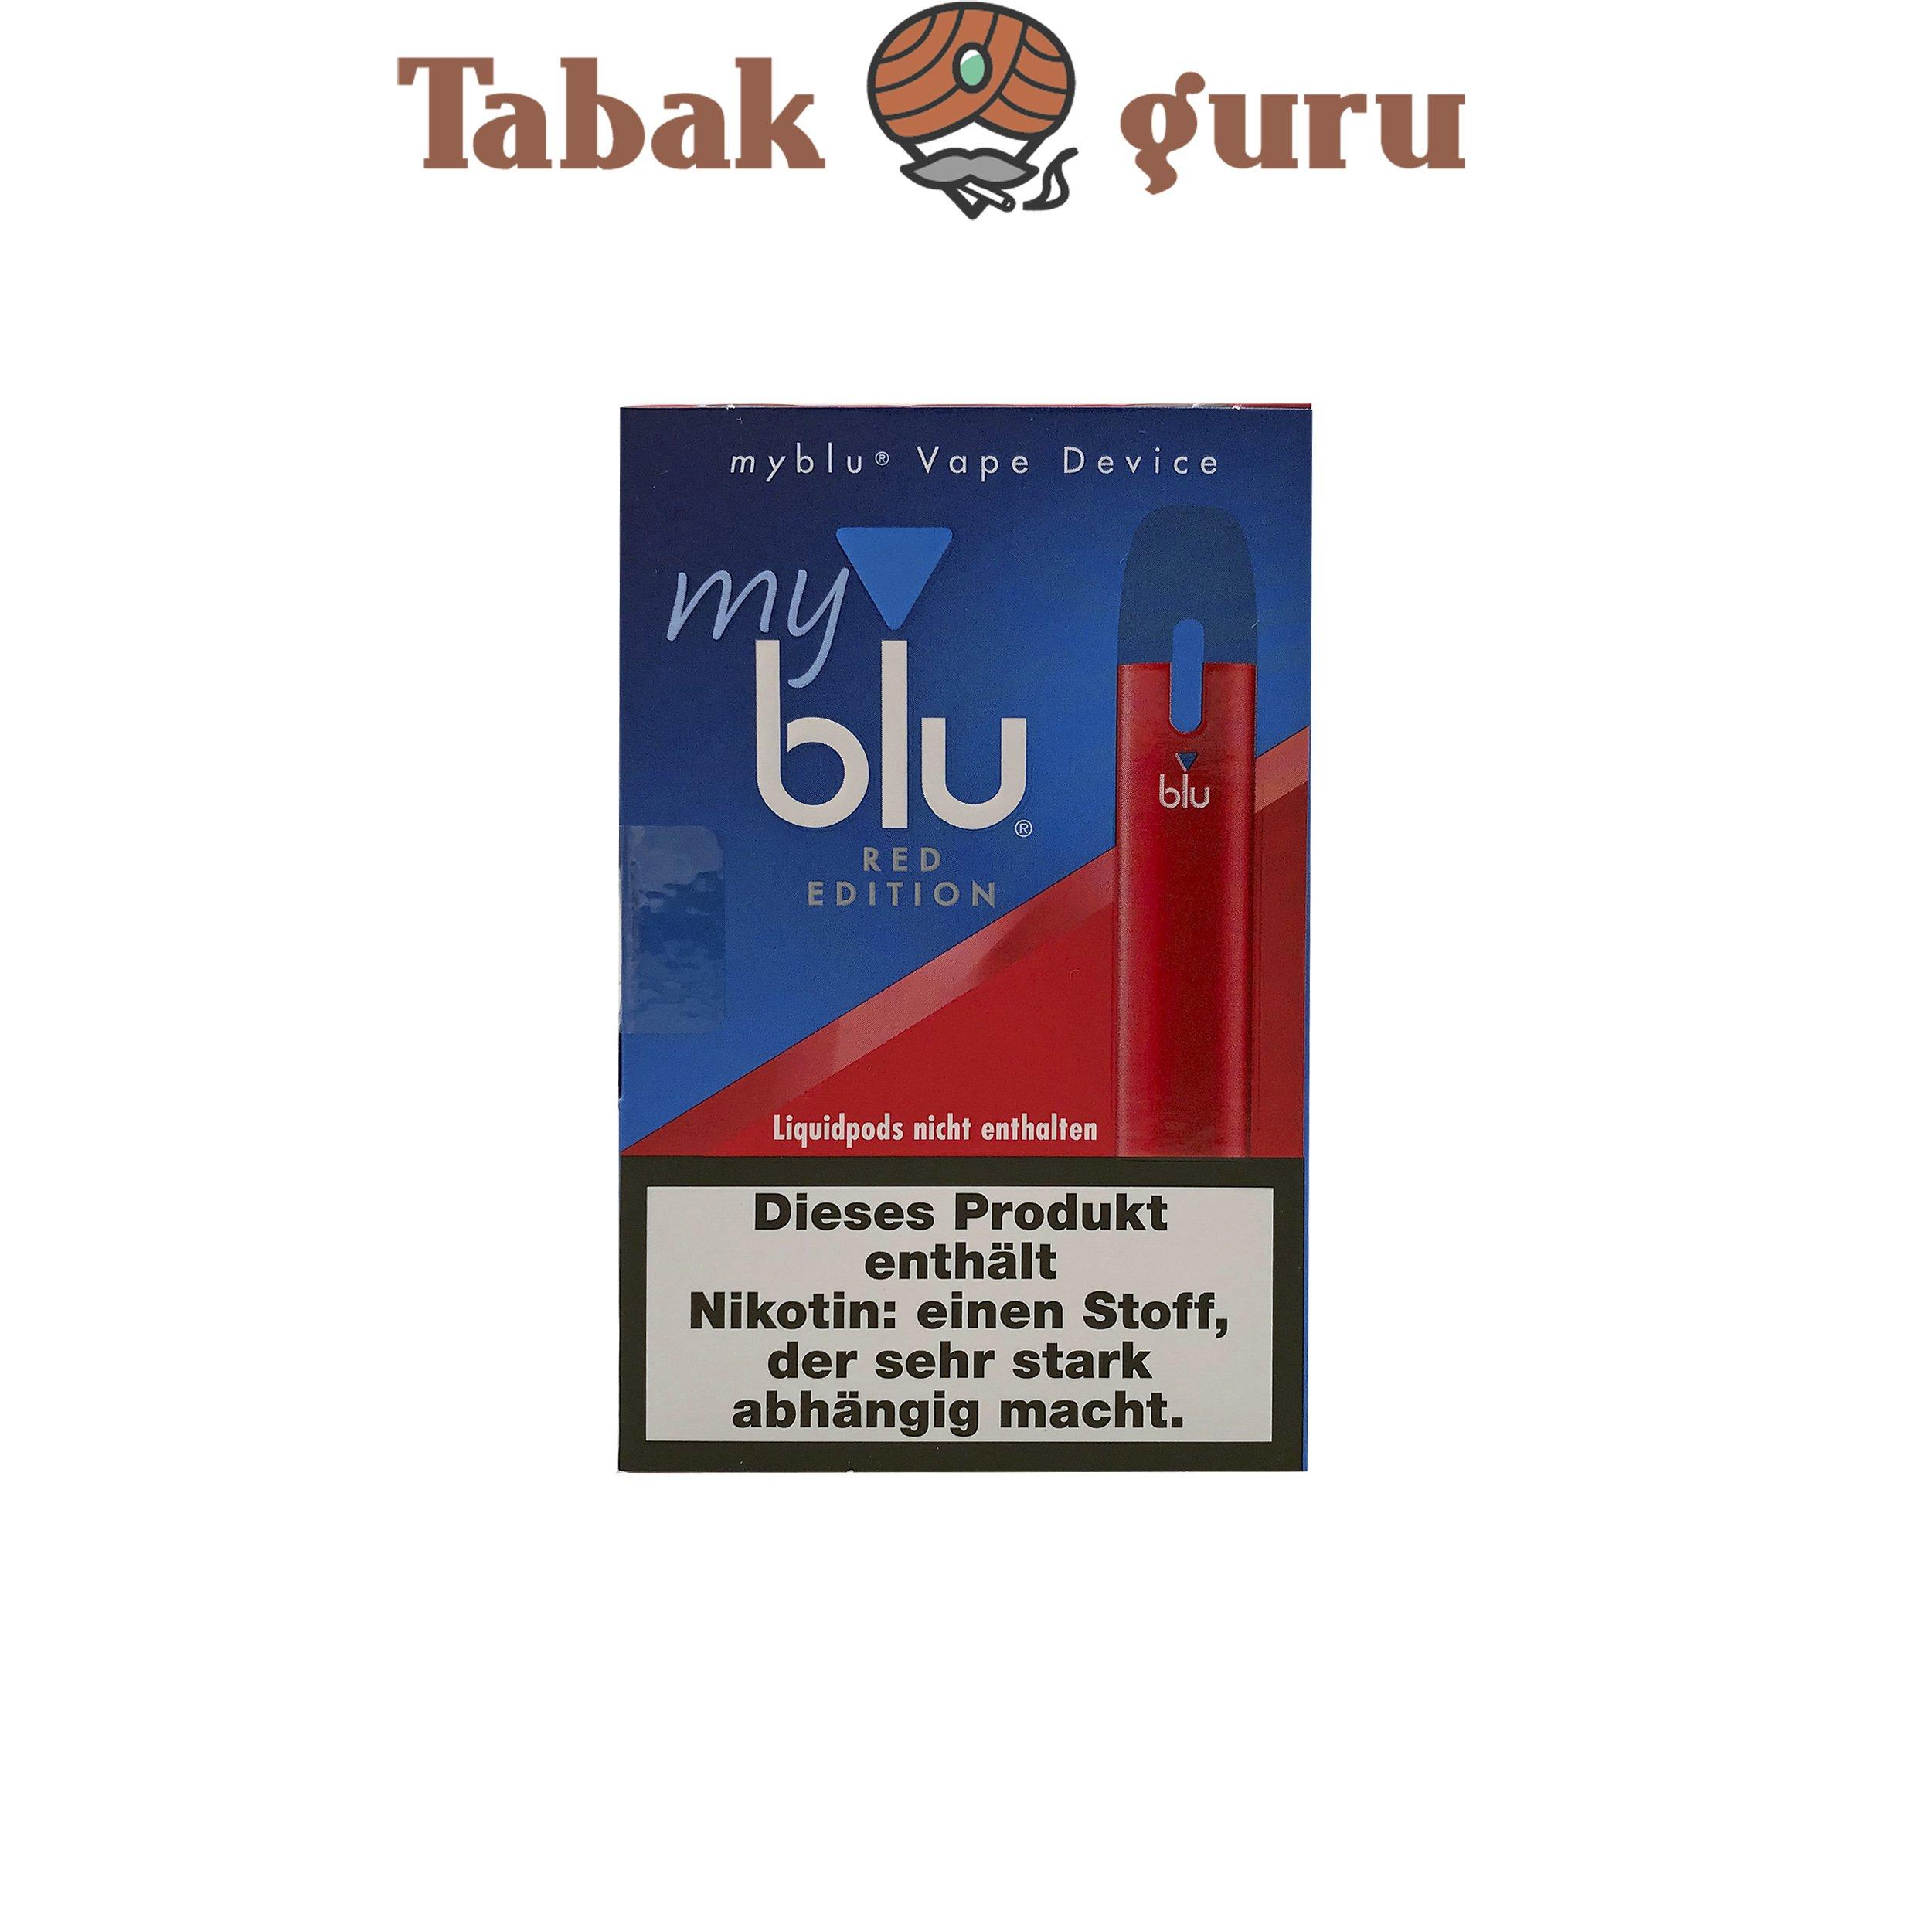 My Blu Vape Device Red Edition